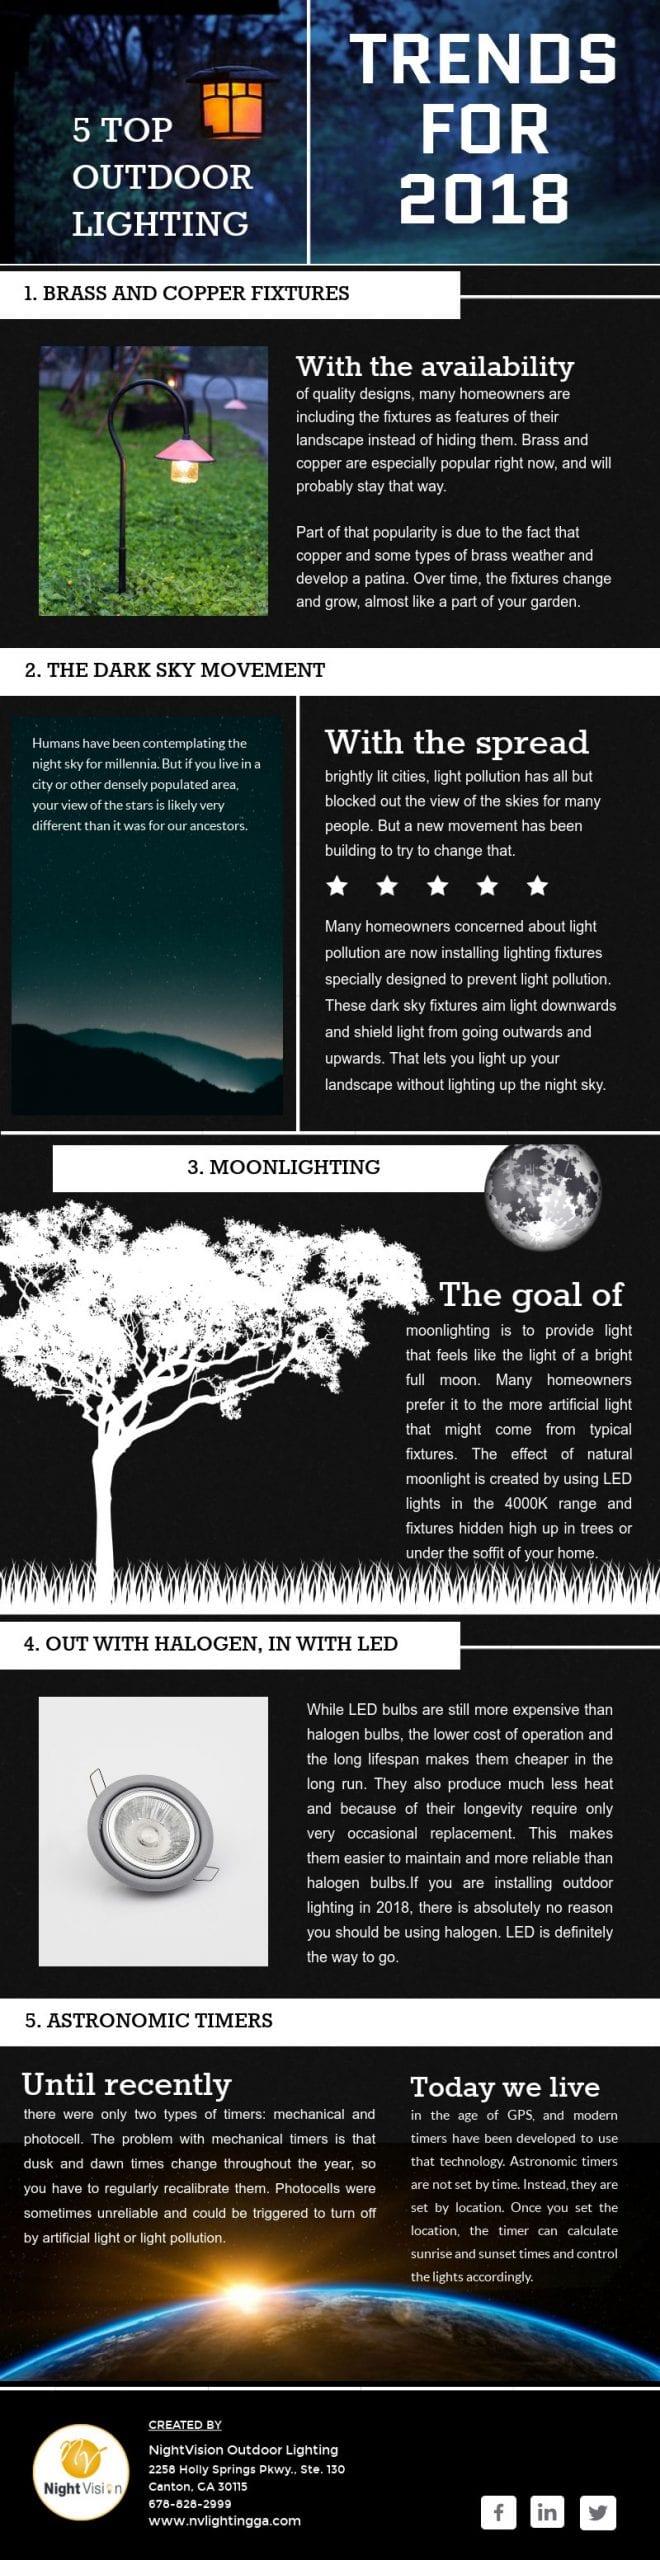 Top-Outdoor-Lighting-Trends-for-2018-[infographic]